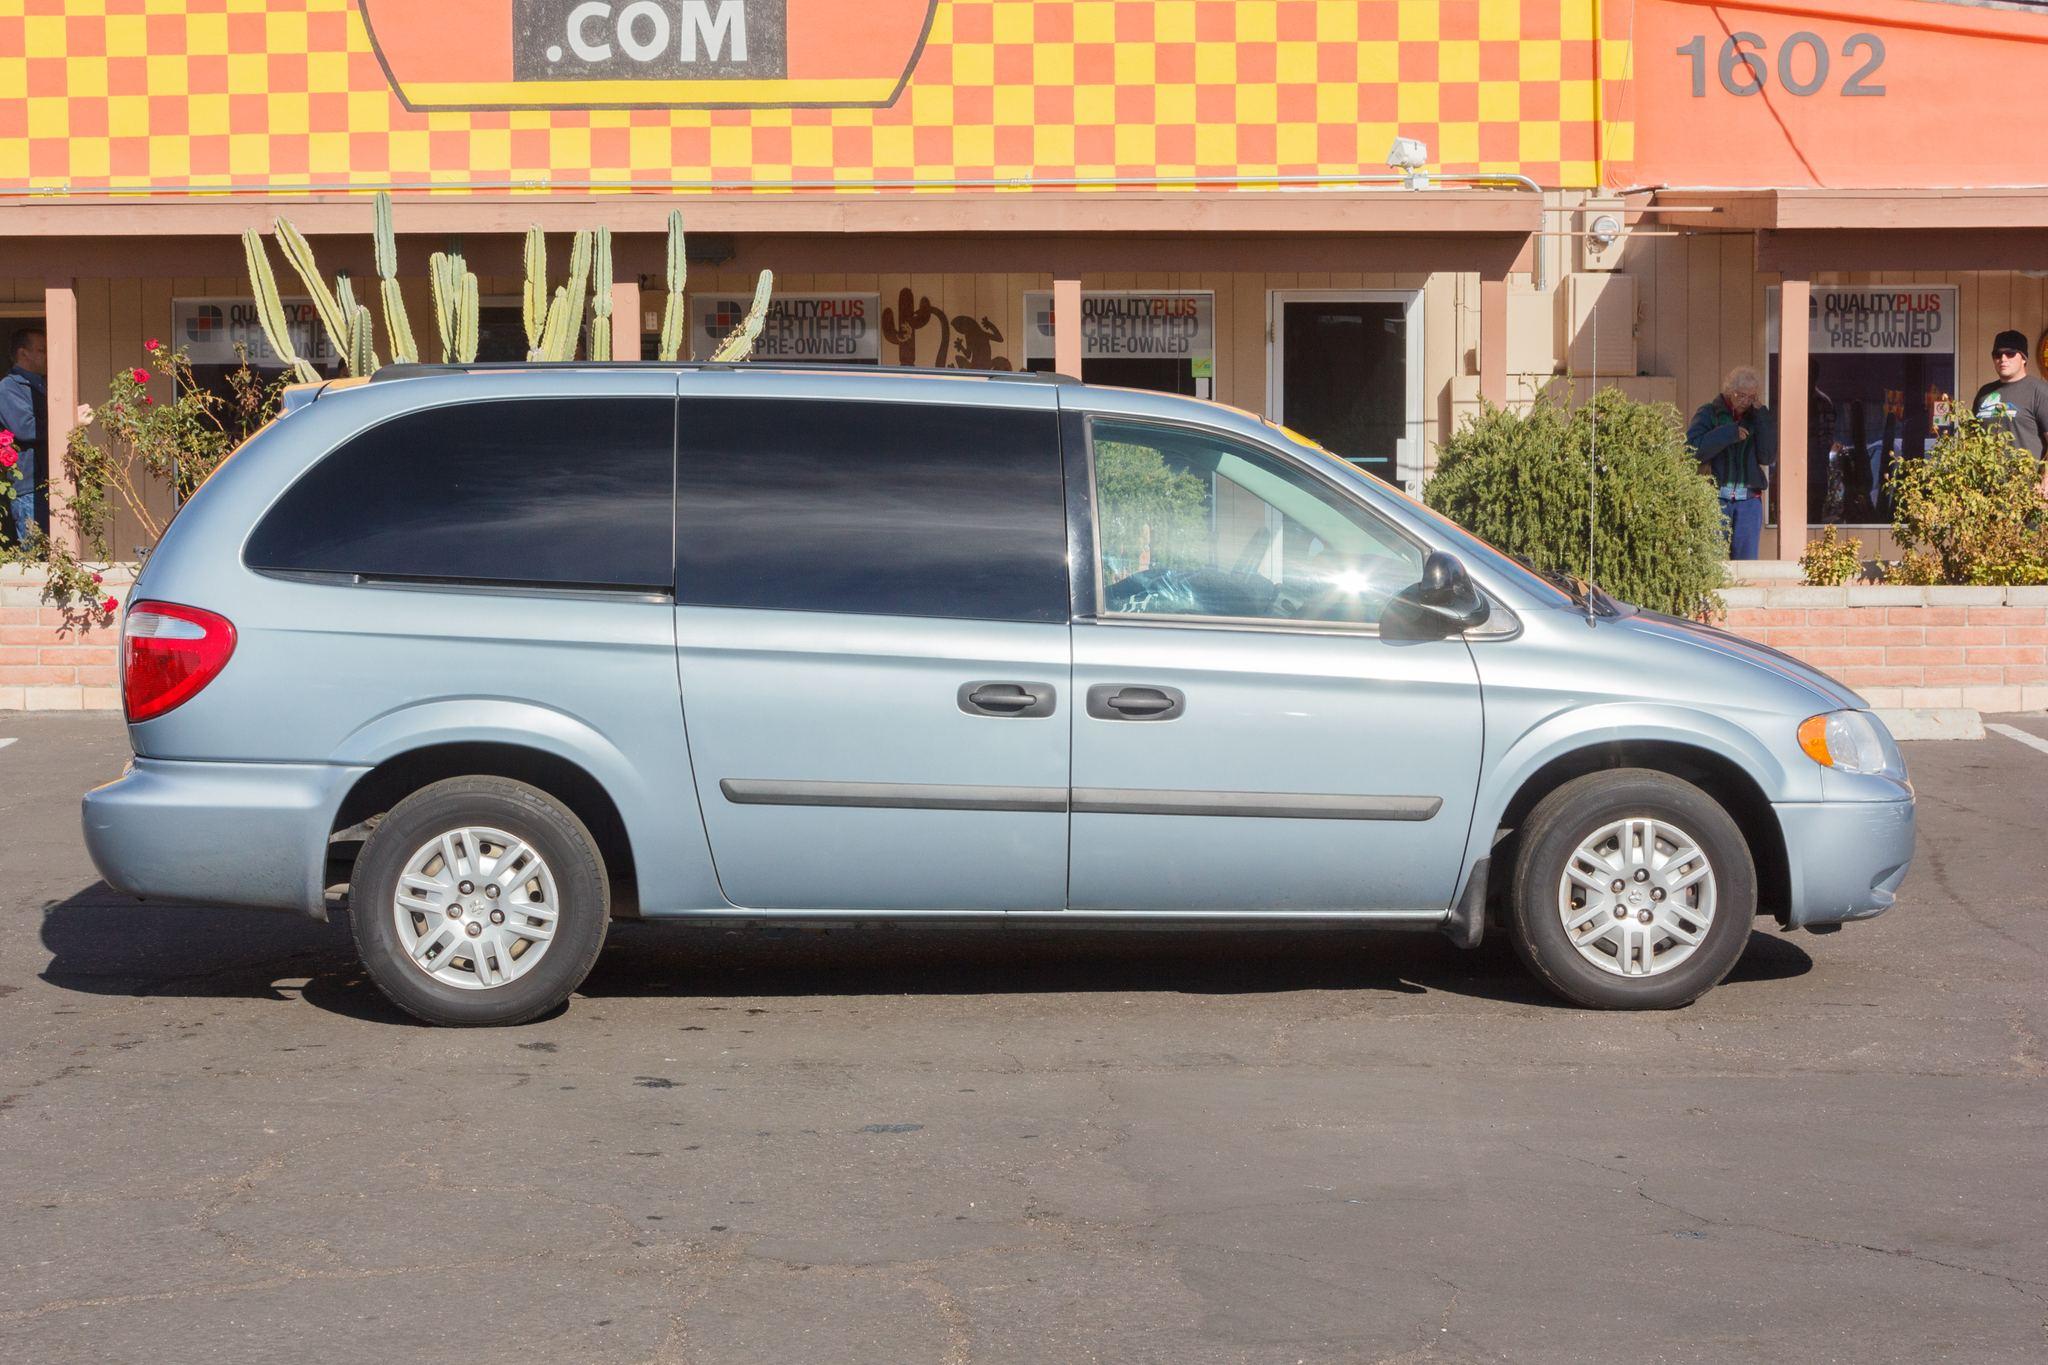 Photo of 2005 Dodge Grand Caravan 4d Wagon SE Midnight Blue Pearlcoat